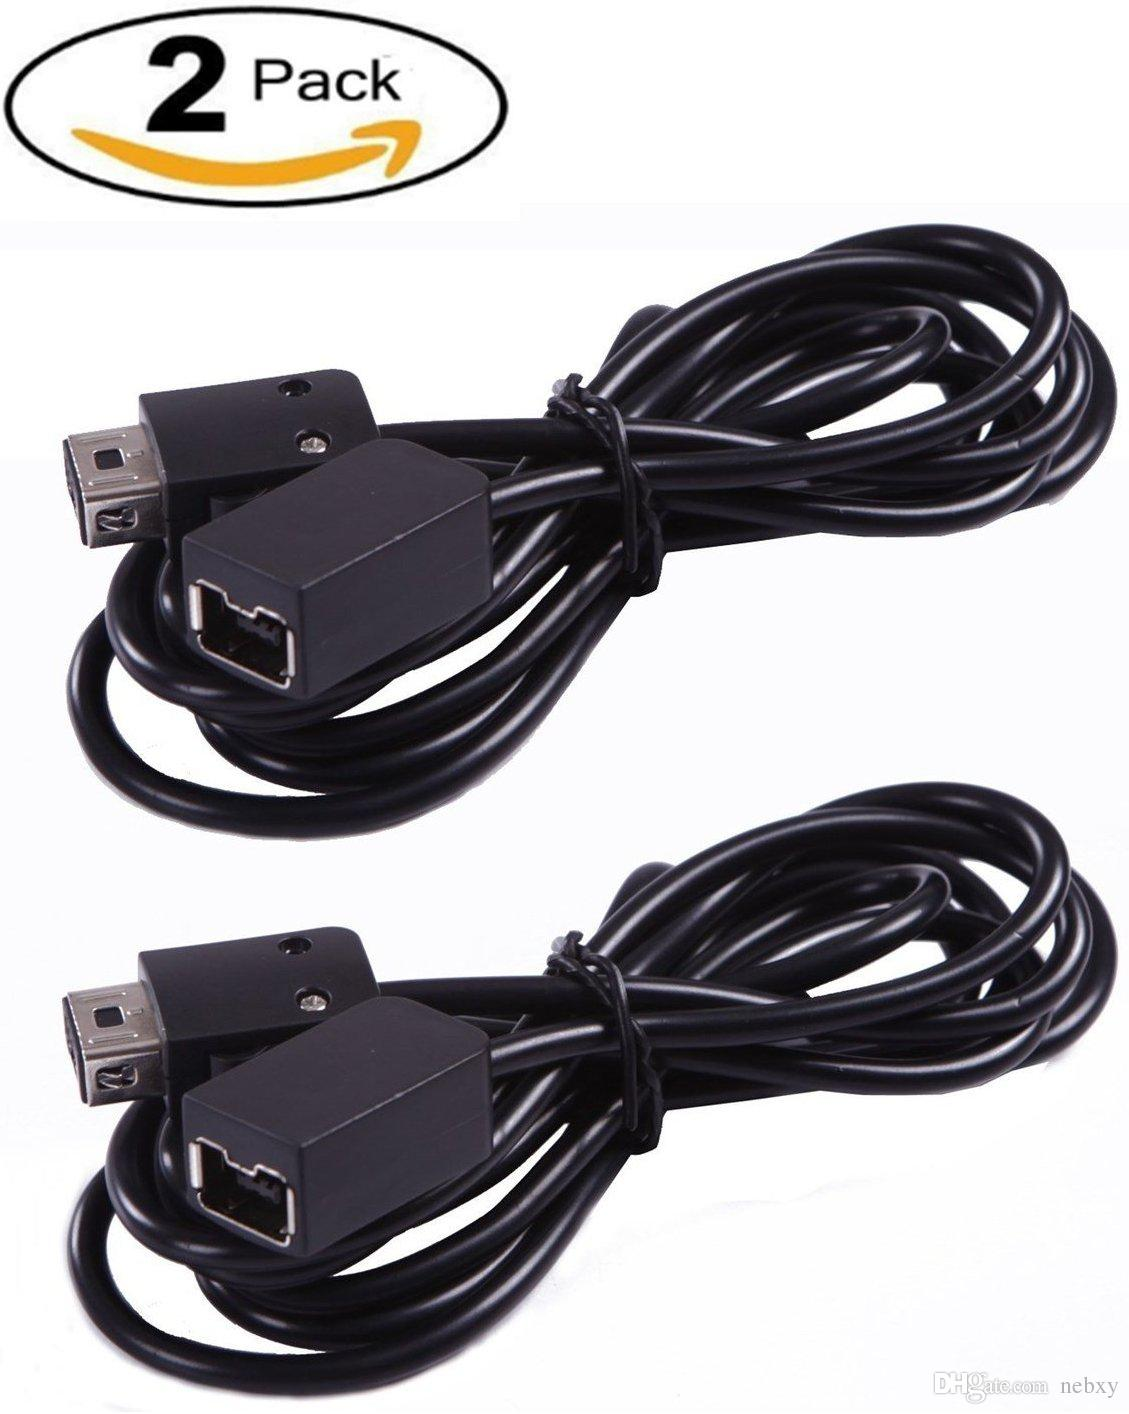 Cable de extensión 2 Pack 10foot / 3Meter para controlador NES Classic Edition y mini controlador NES, negro